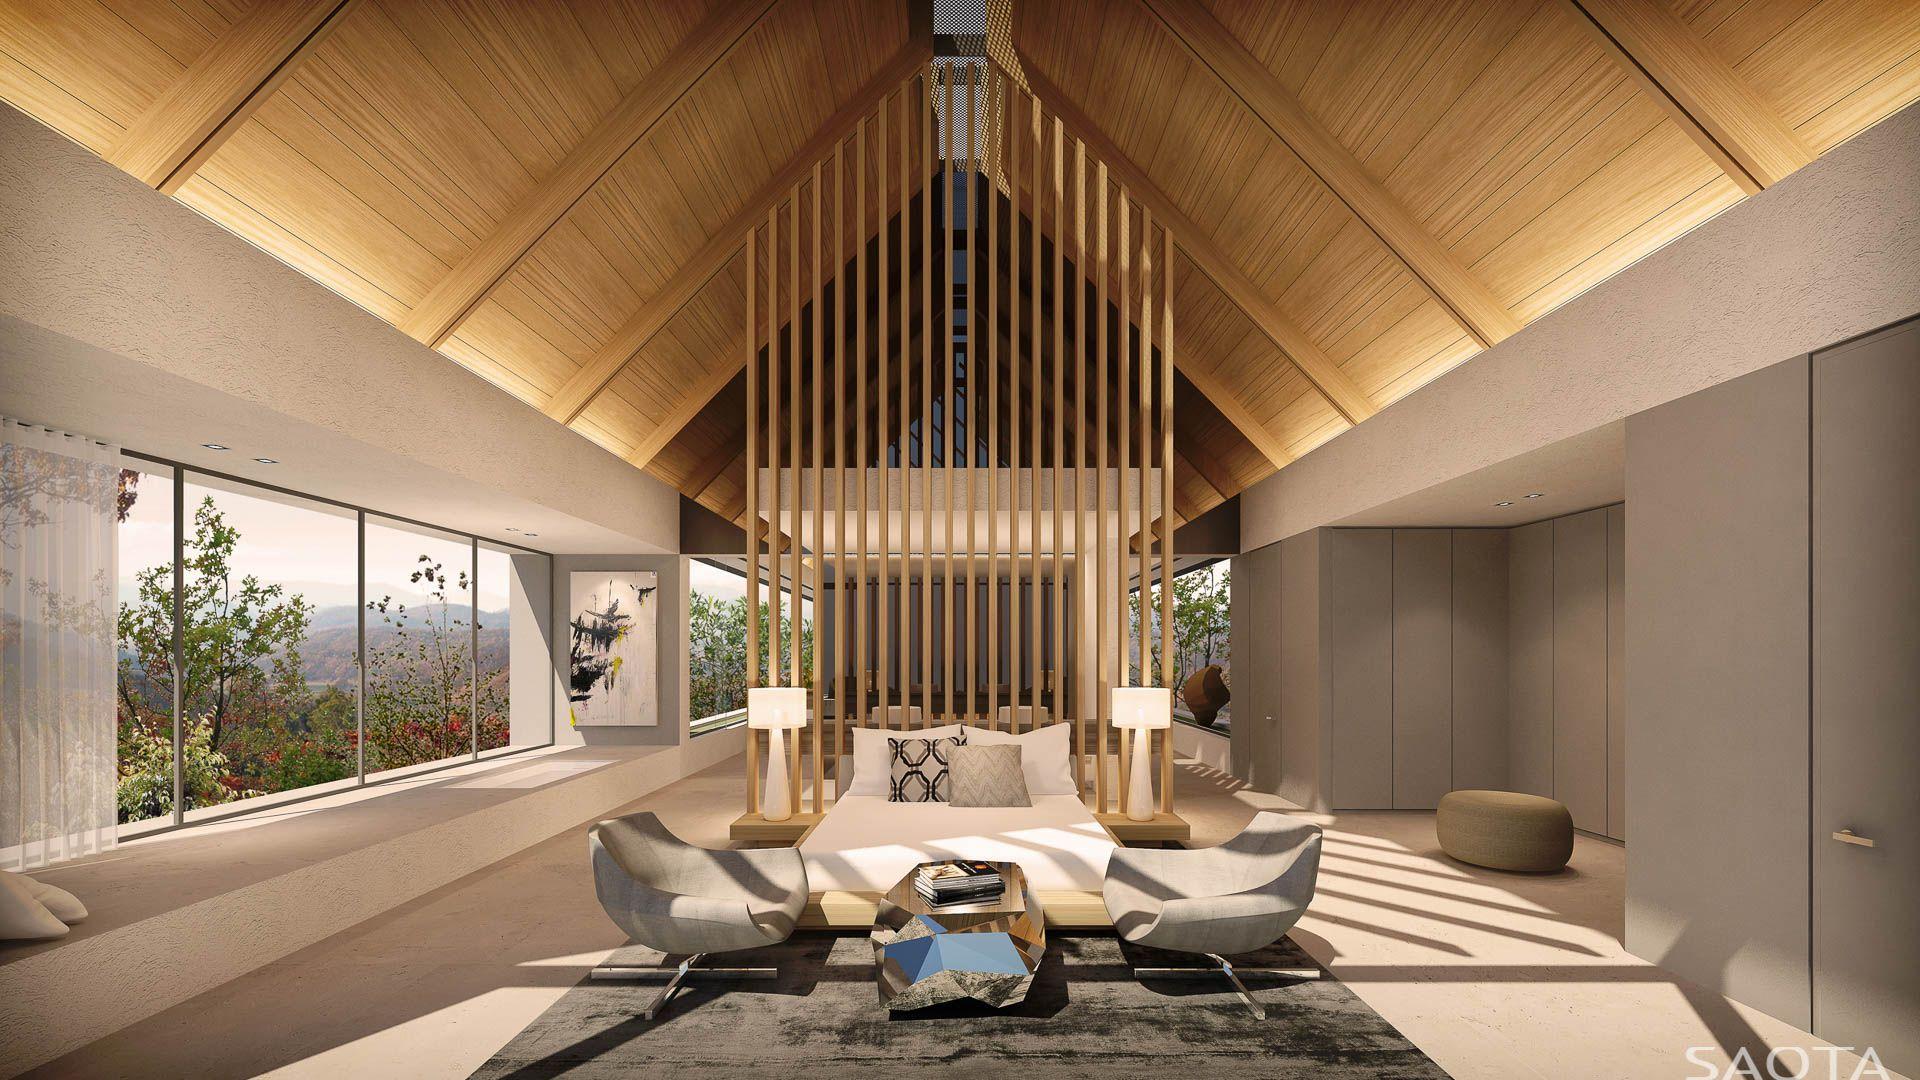 ZW WATERBERRY SAOTA Architecture And Design Villas Pinterest